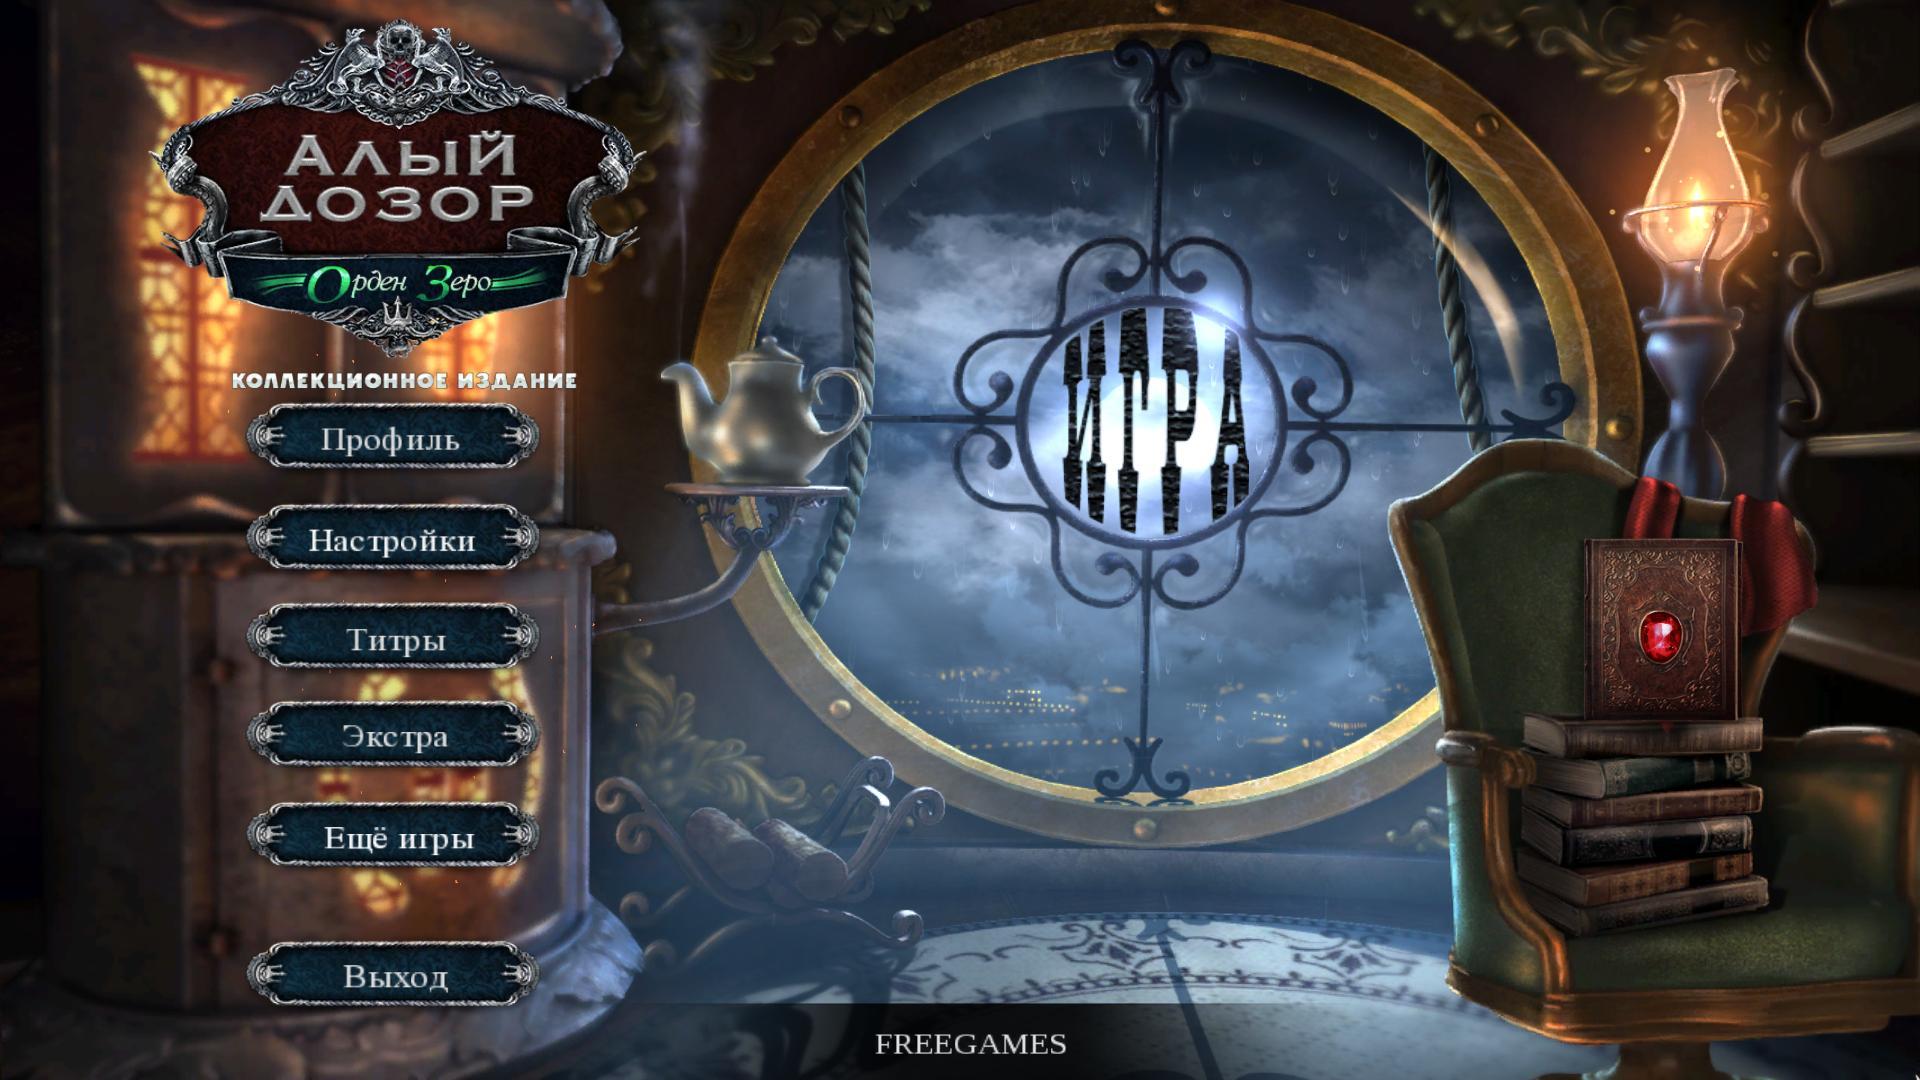 Алый дозор 3: Орден Зеро. Коллекционное издание | Vermillion Watch 3: Order Zero CE (Rus)